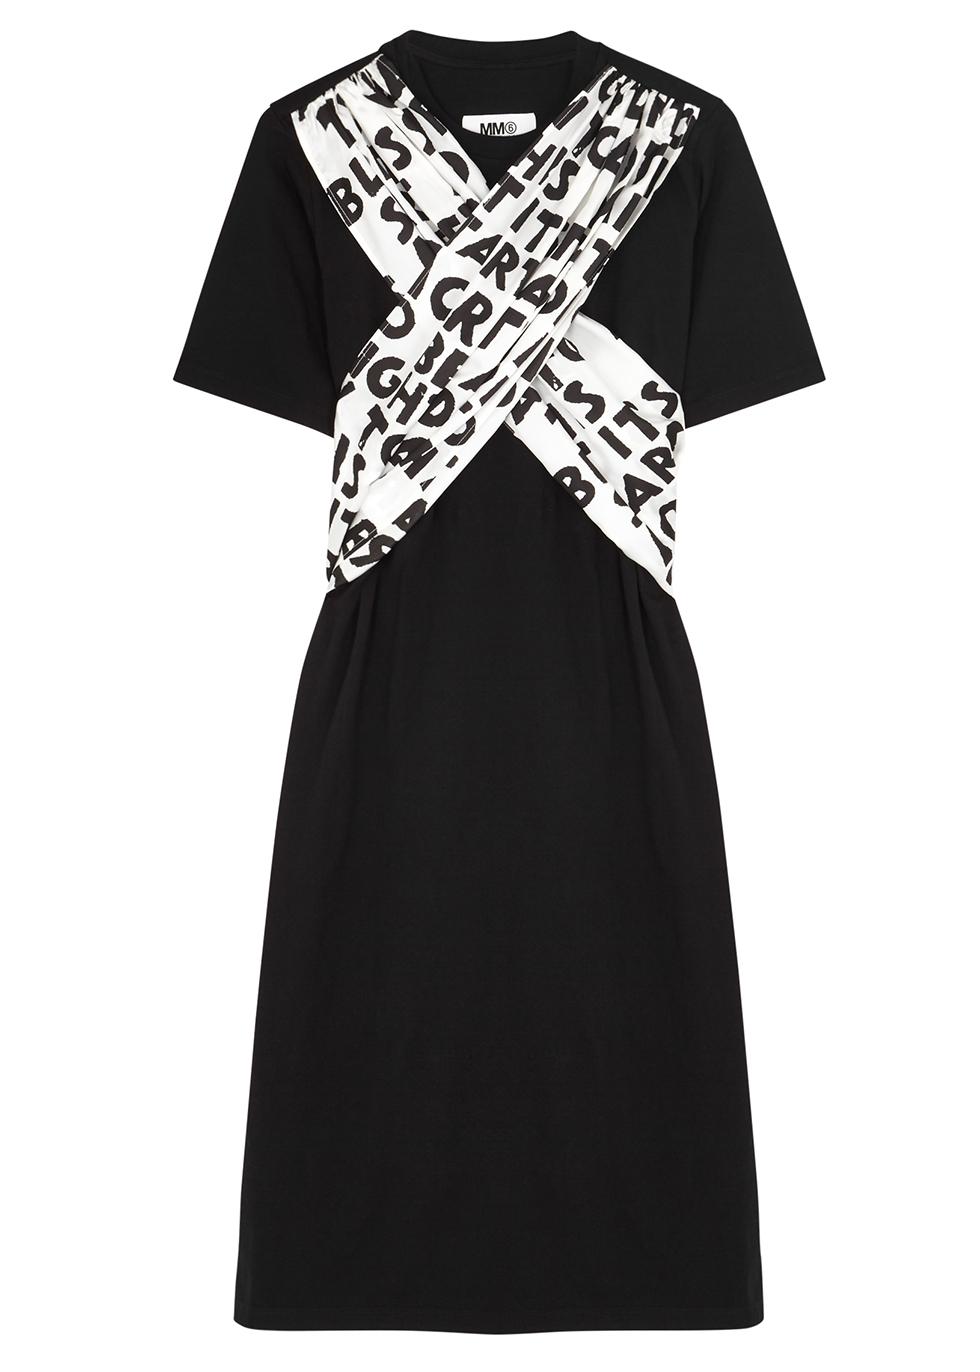 Black printed cotton T-shirt dress - MM6 by Maison Margiela